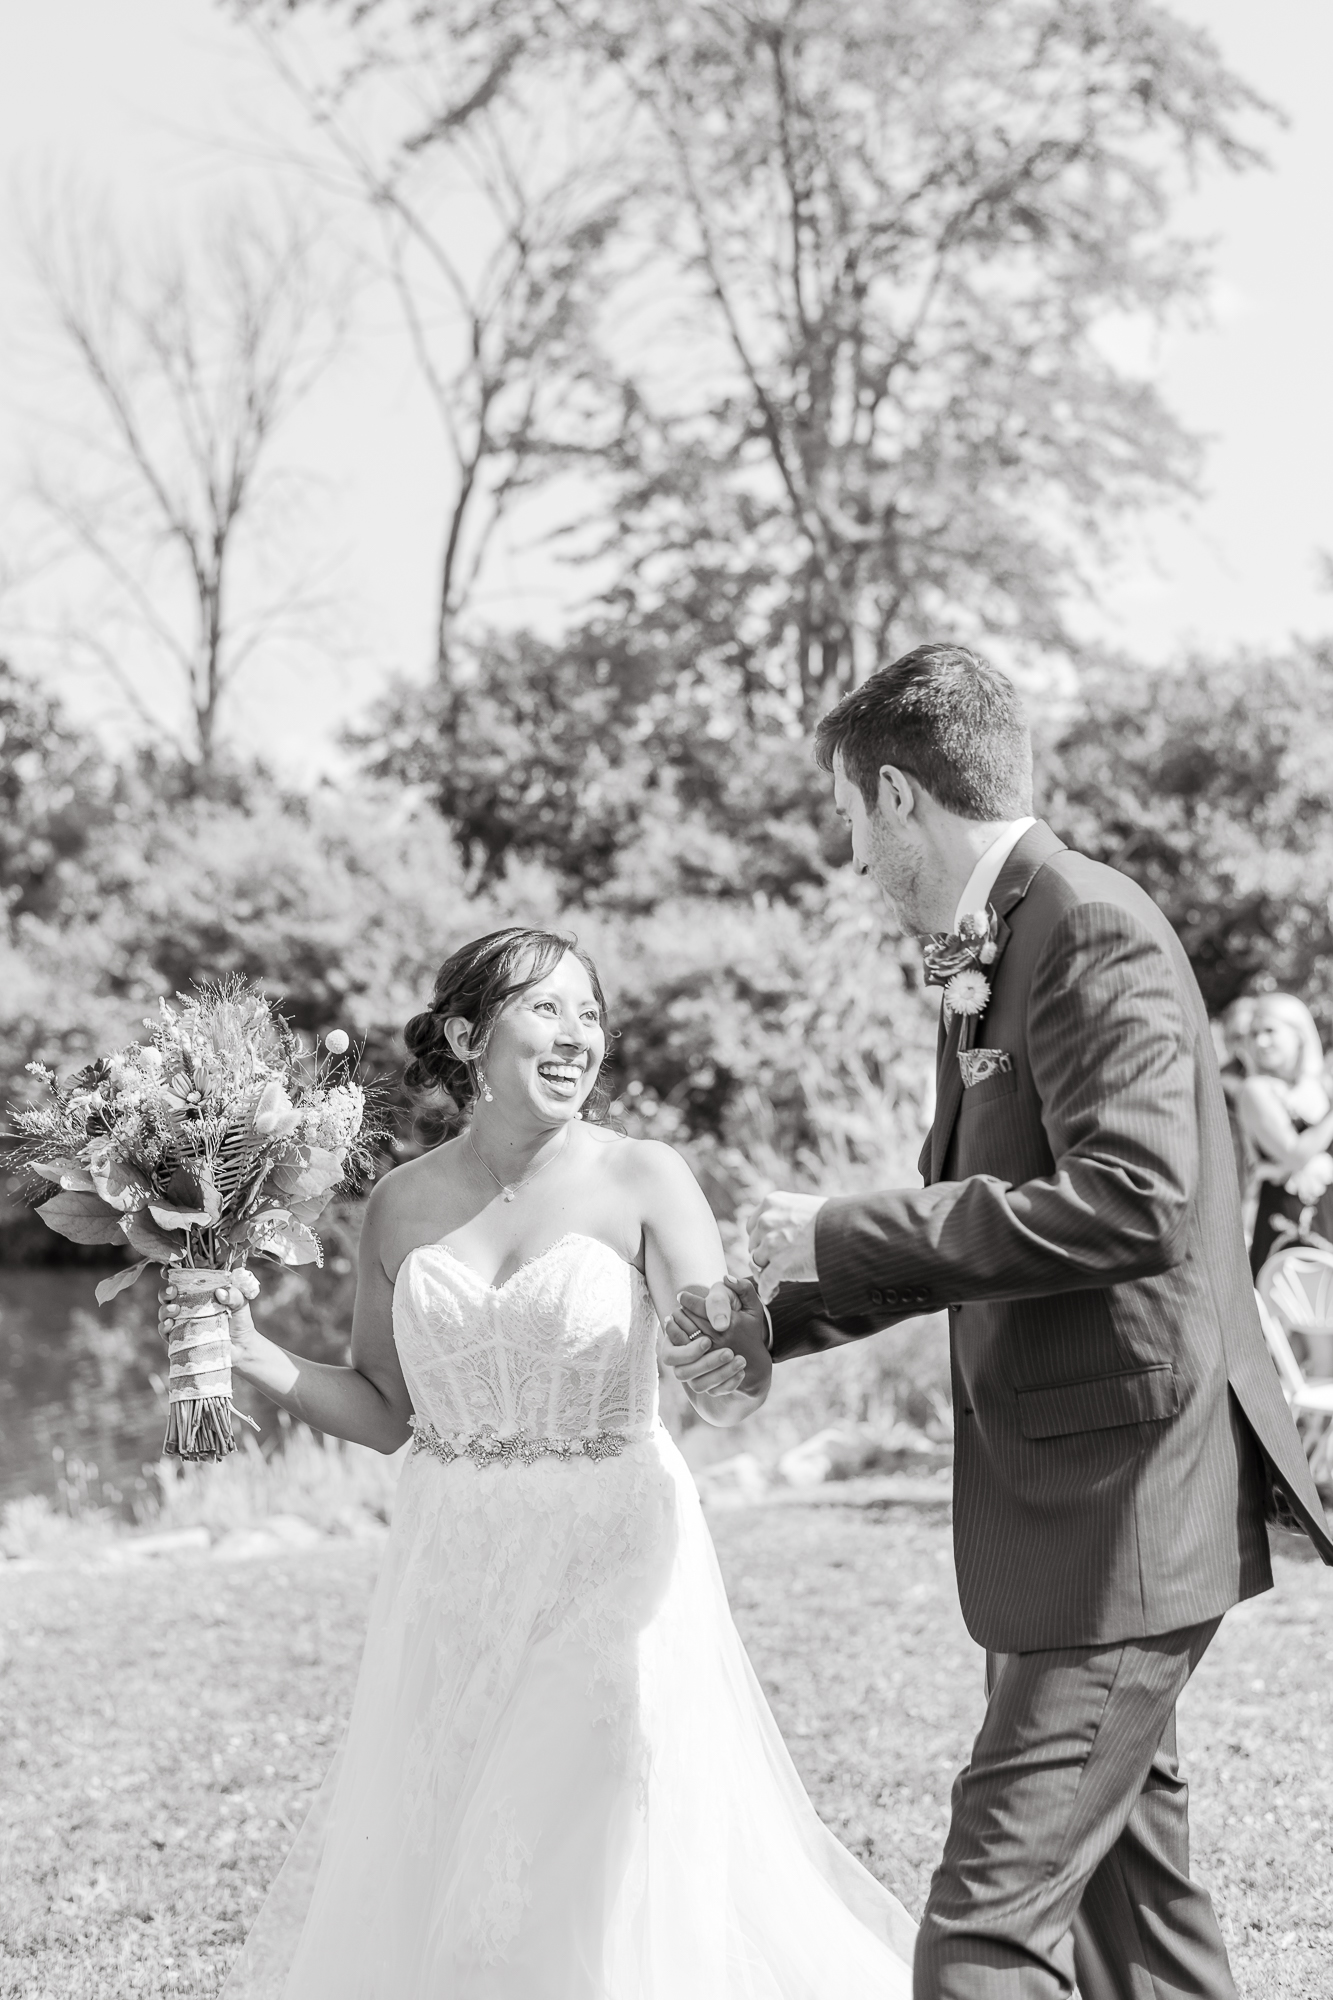 Maria+Adam_Summer Barn Wedding_The Barn at The North Star Preserve_Oberlin_Ohio-179.jpg